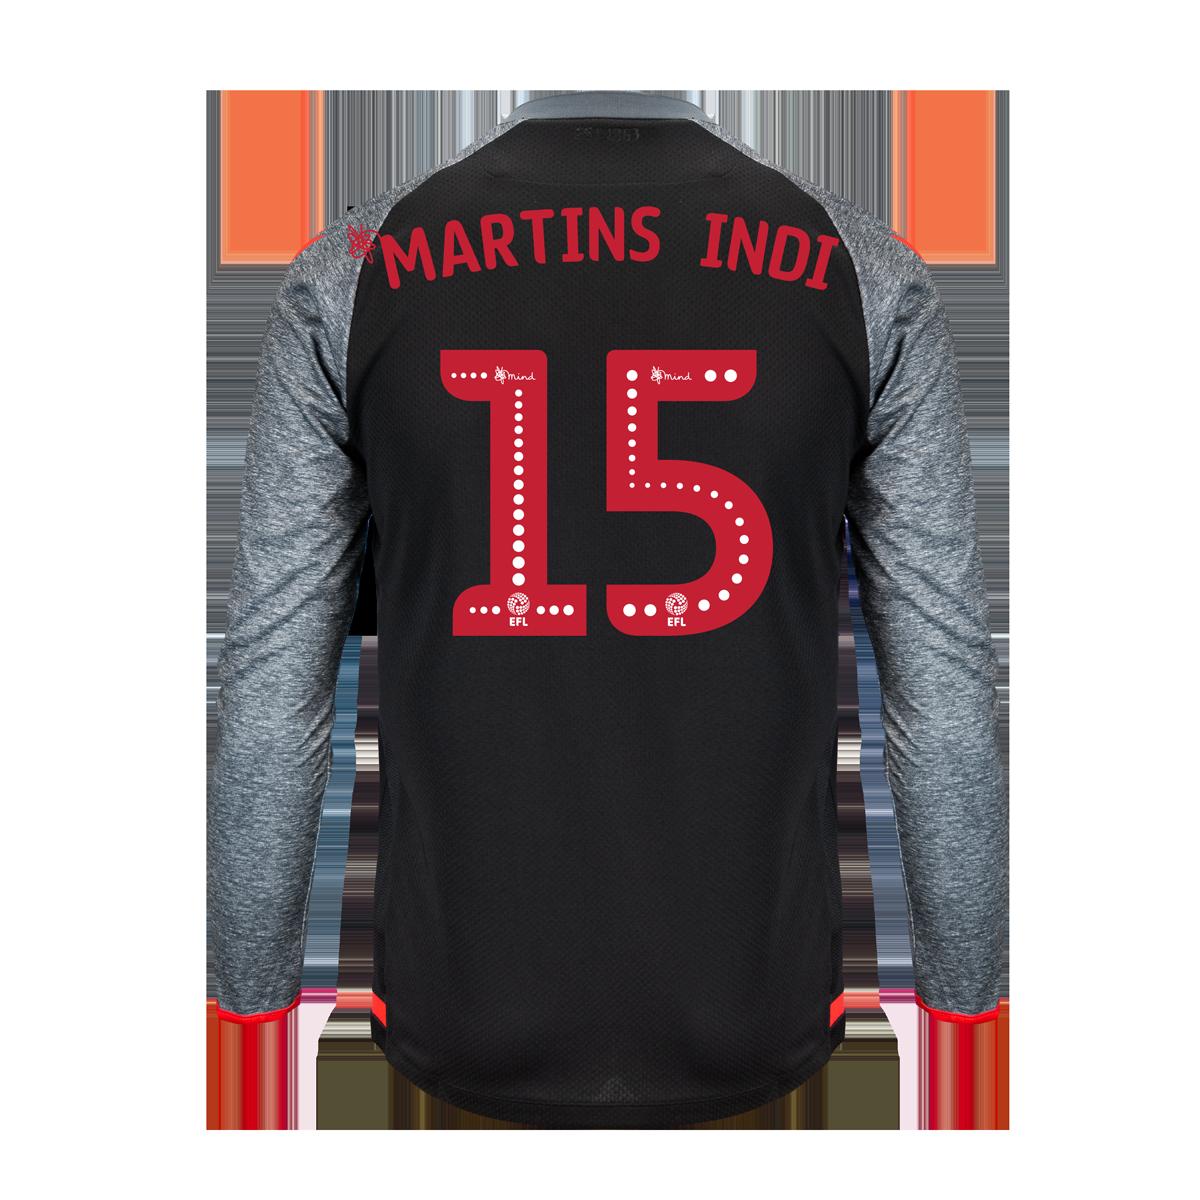 2019/20 Adult Away LS Shirt - Martins Indi